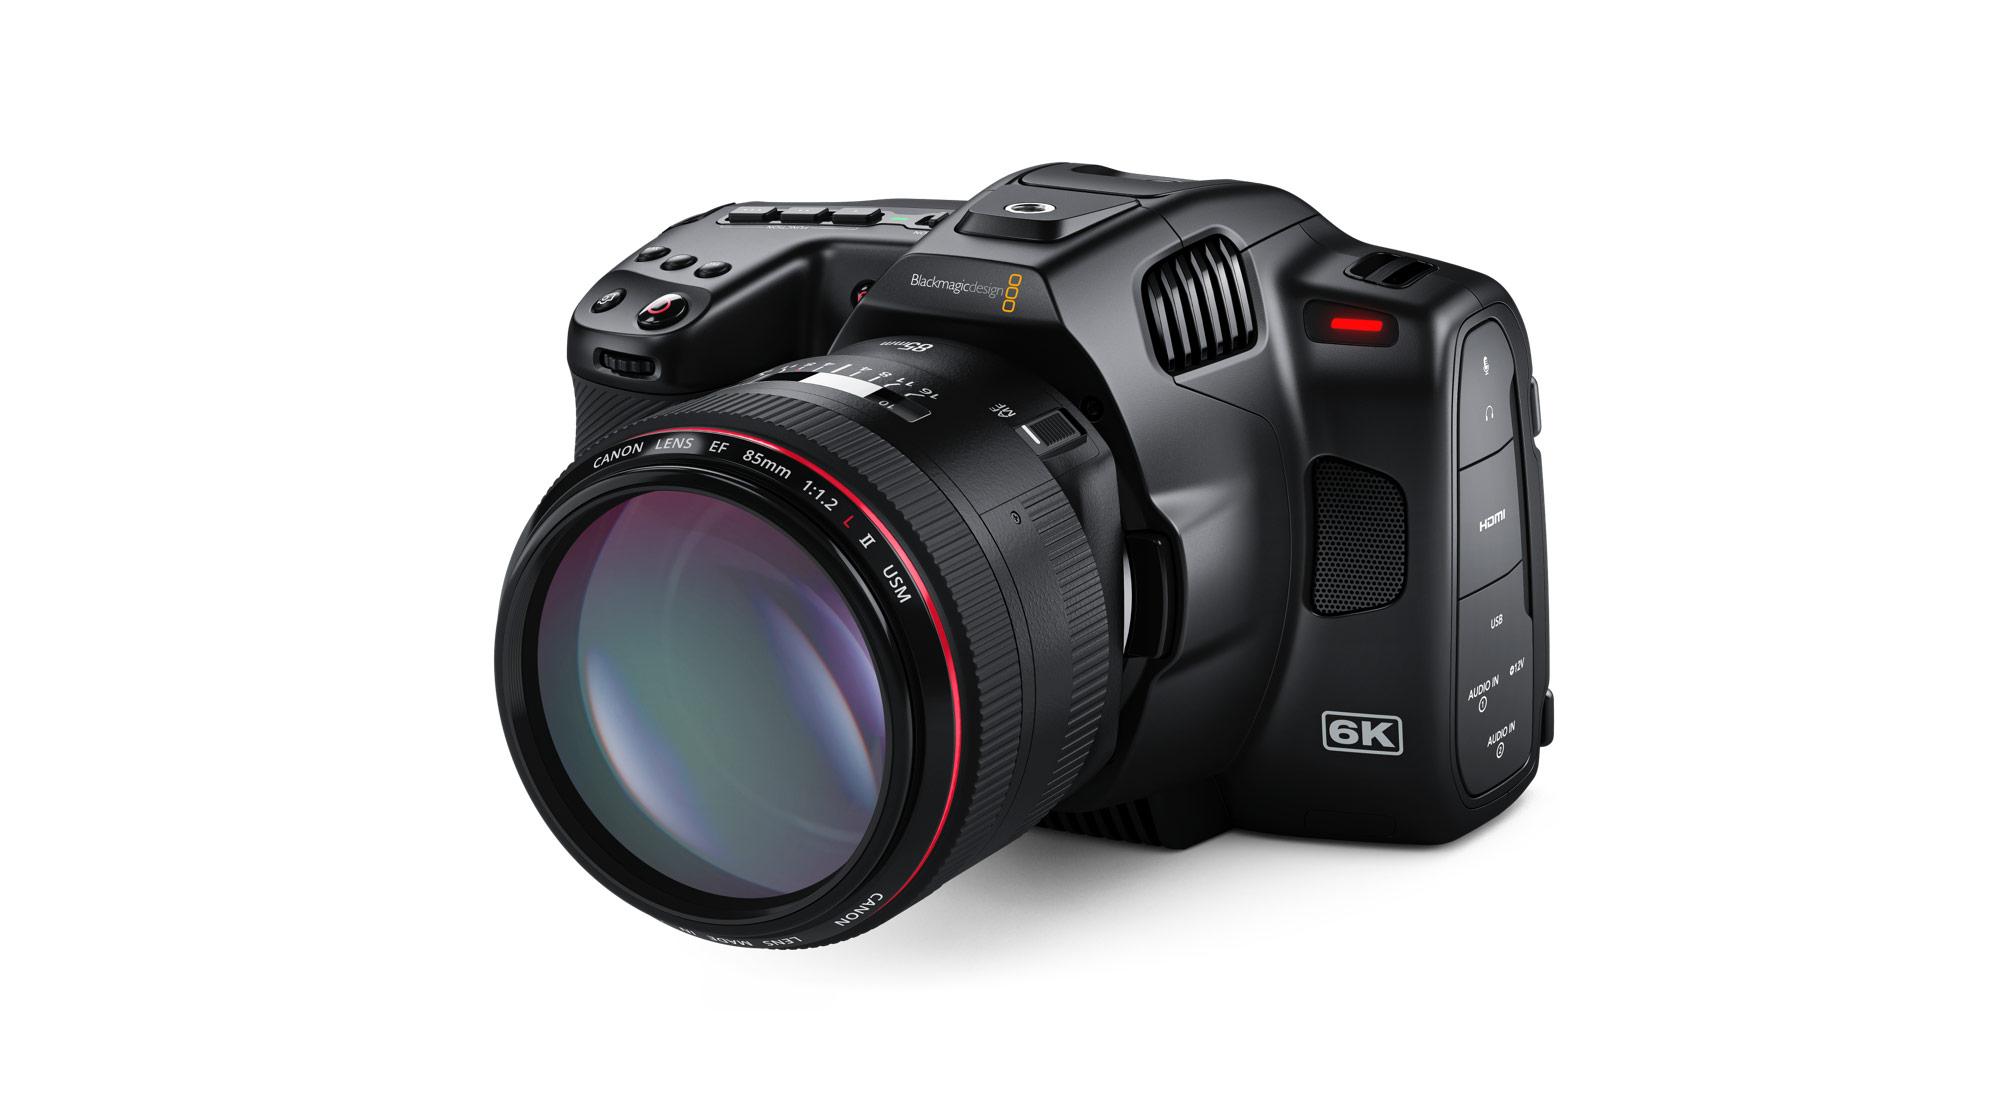 Blackmagic Pocket Cinema Camera 6K Pro con Touchscreen HDR inclinabile